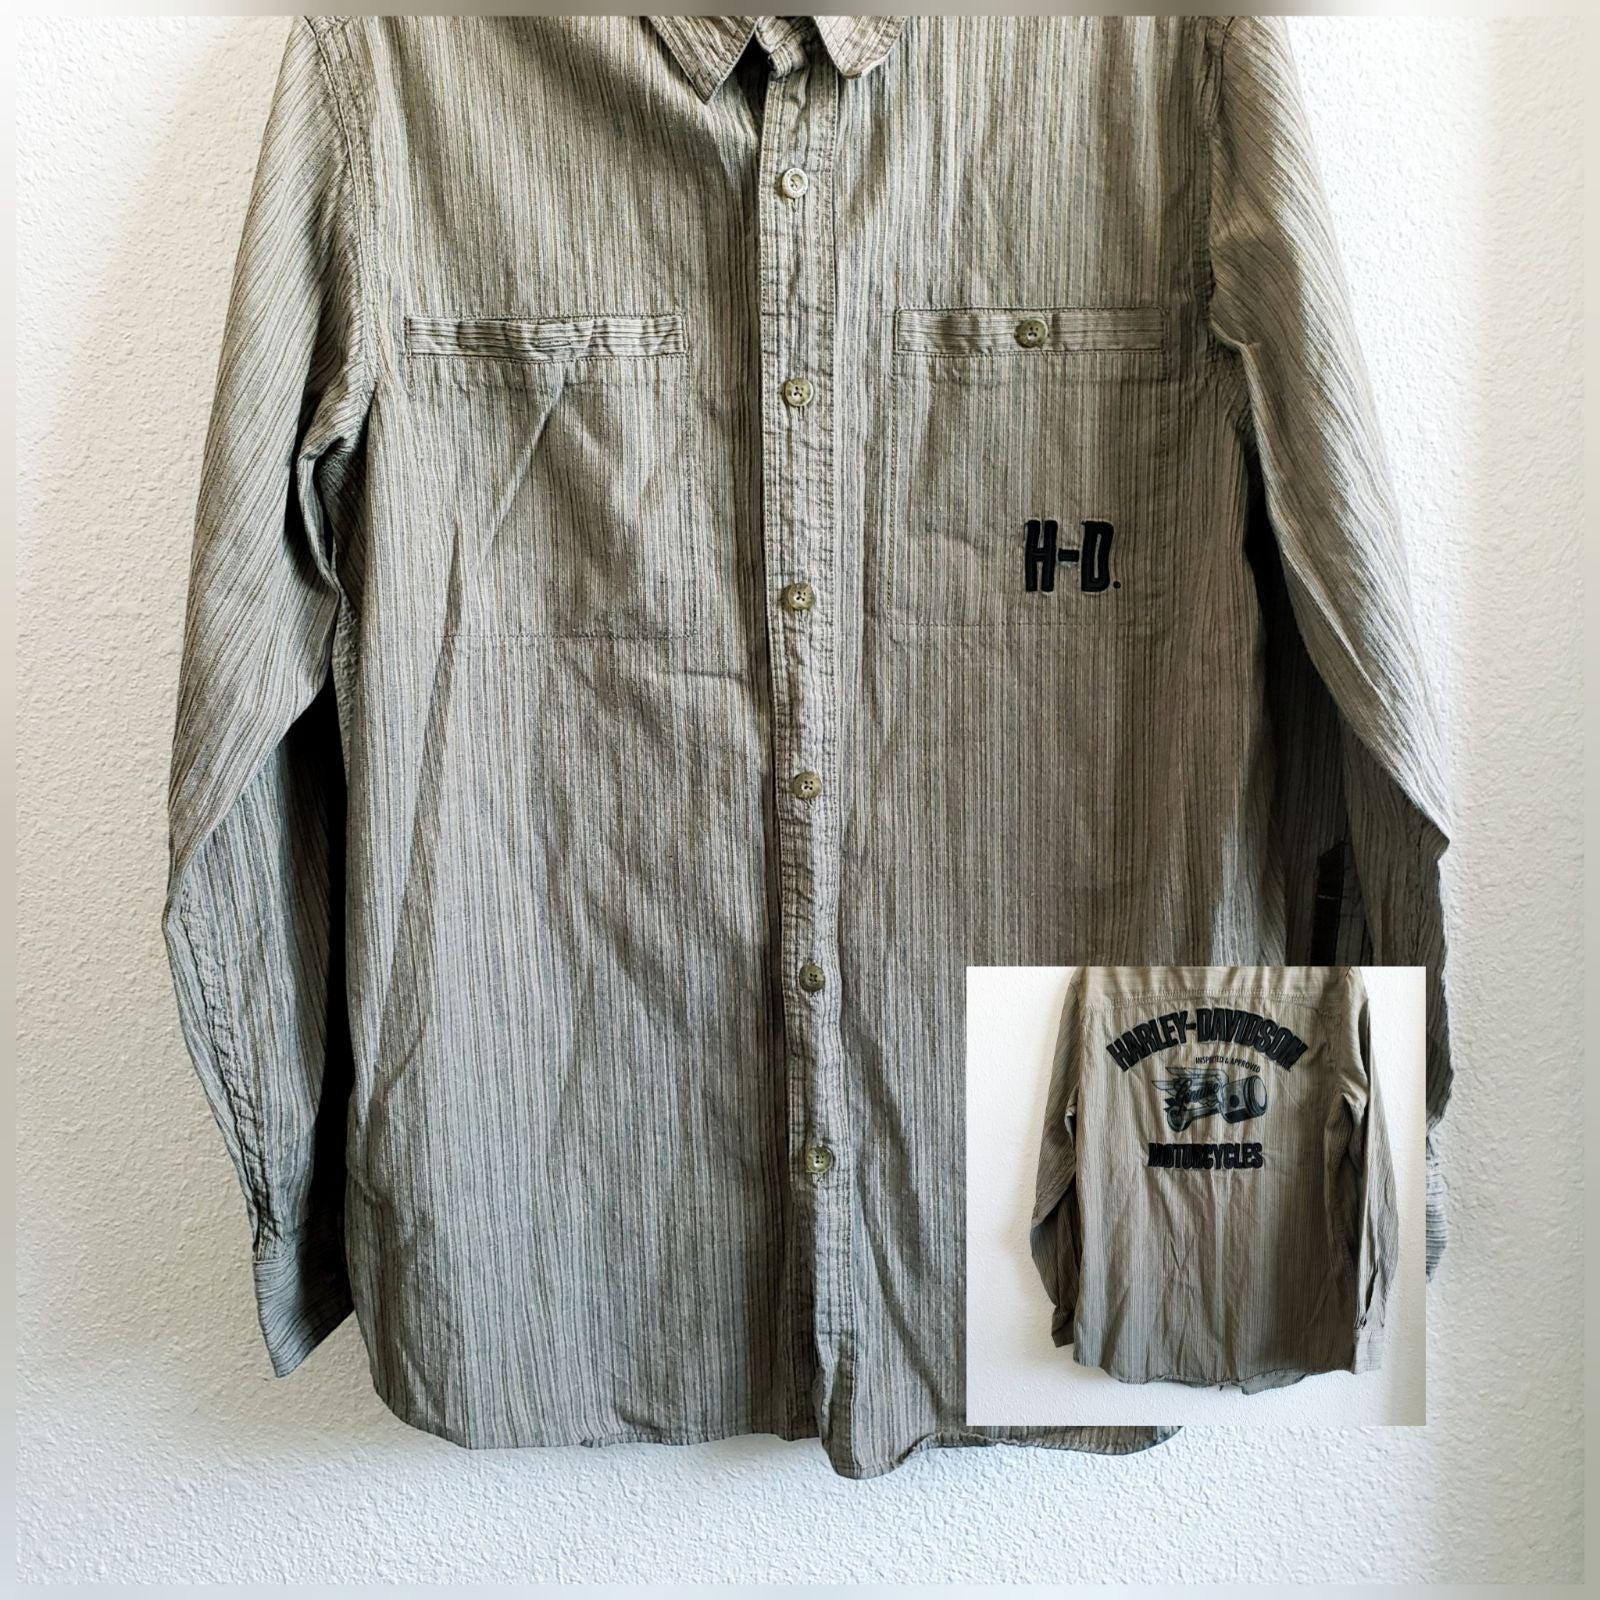 Harley Davidson embroidered  shirt